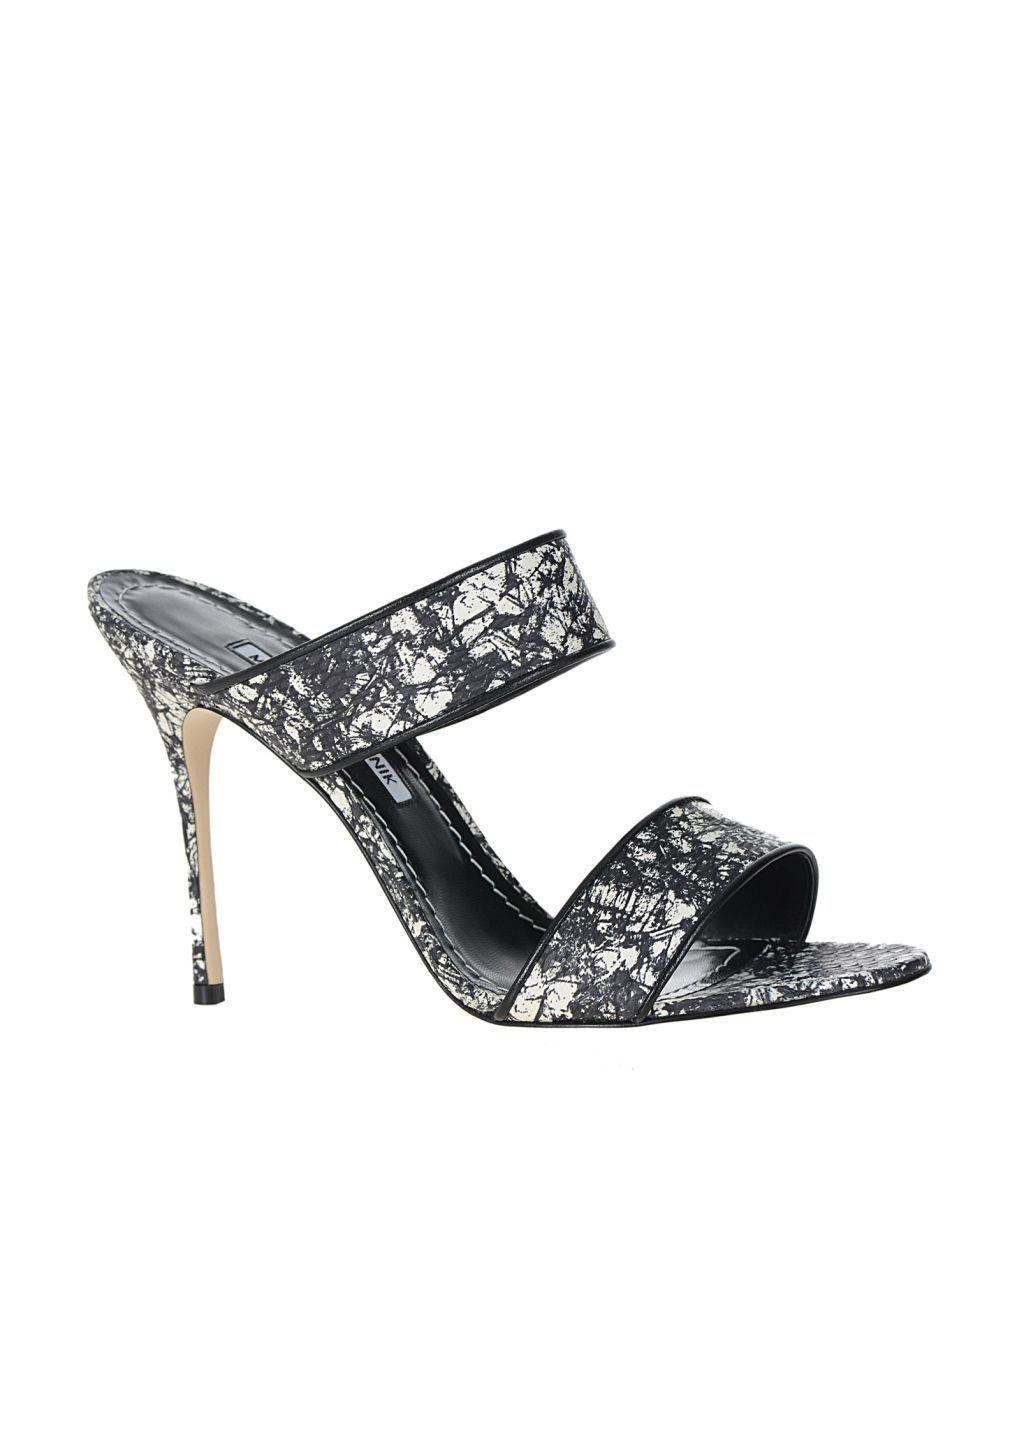 90b9ff8d8bf Manolo Blahnik RTW Spring 2016  manoloblahnikheels2017 Shoe Brands